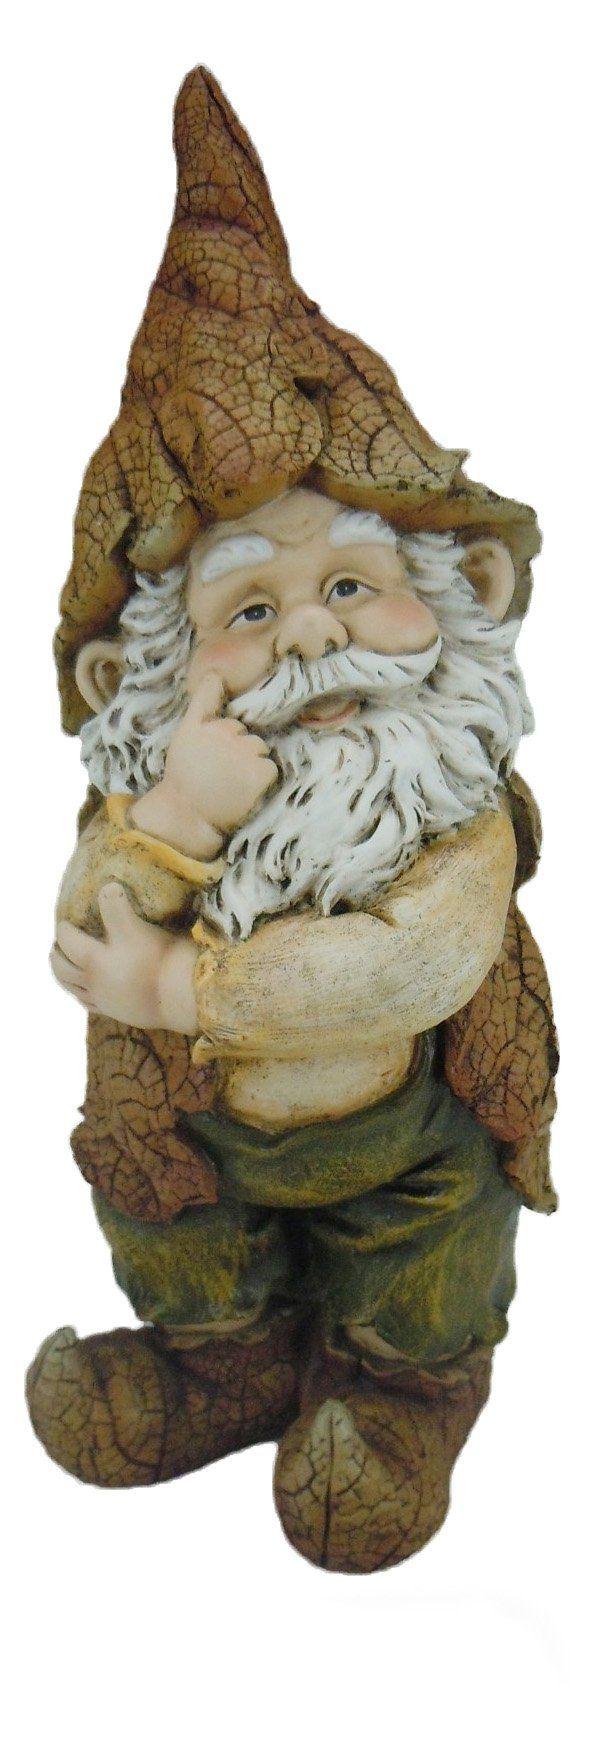 Hi-Line Gift Ltd. Thinking Gnome Garden Statue - 75607-A